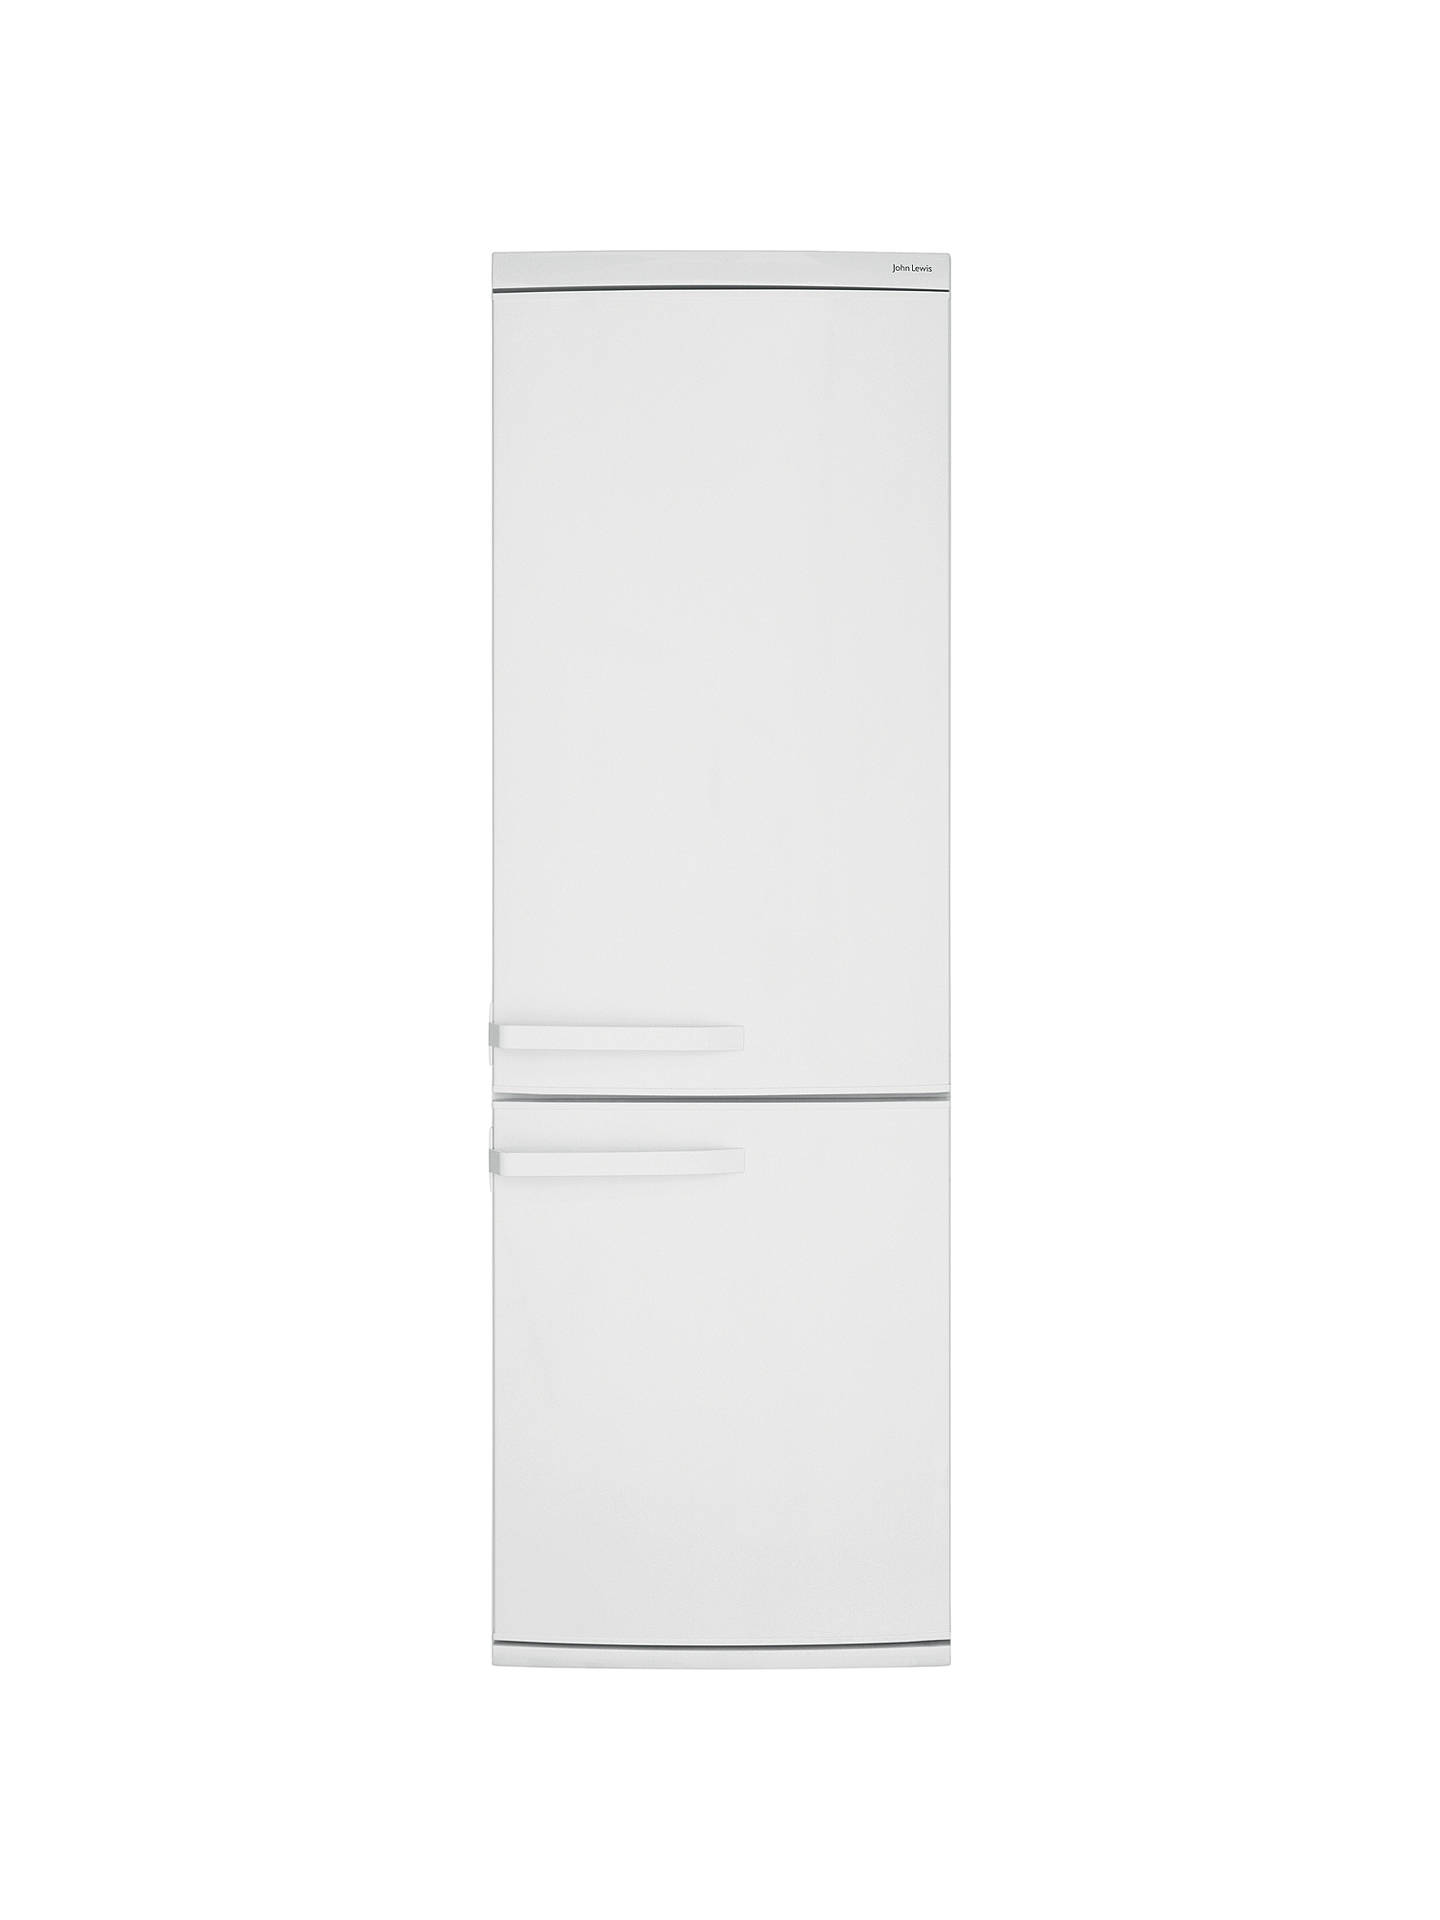 john lewis partners jlffw1817 fridge freezer a energy. Black Bedroom Furniture Sets. Home Design Ideas